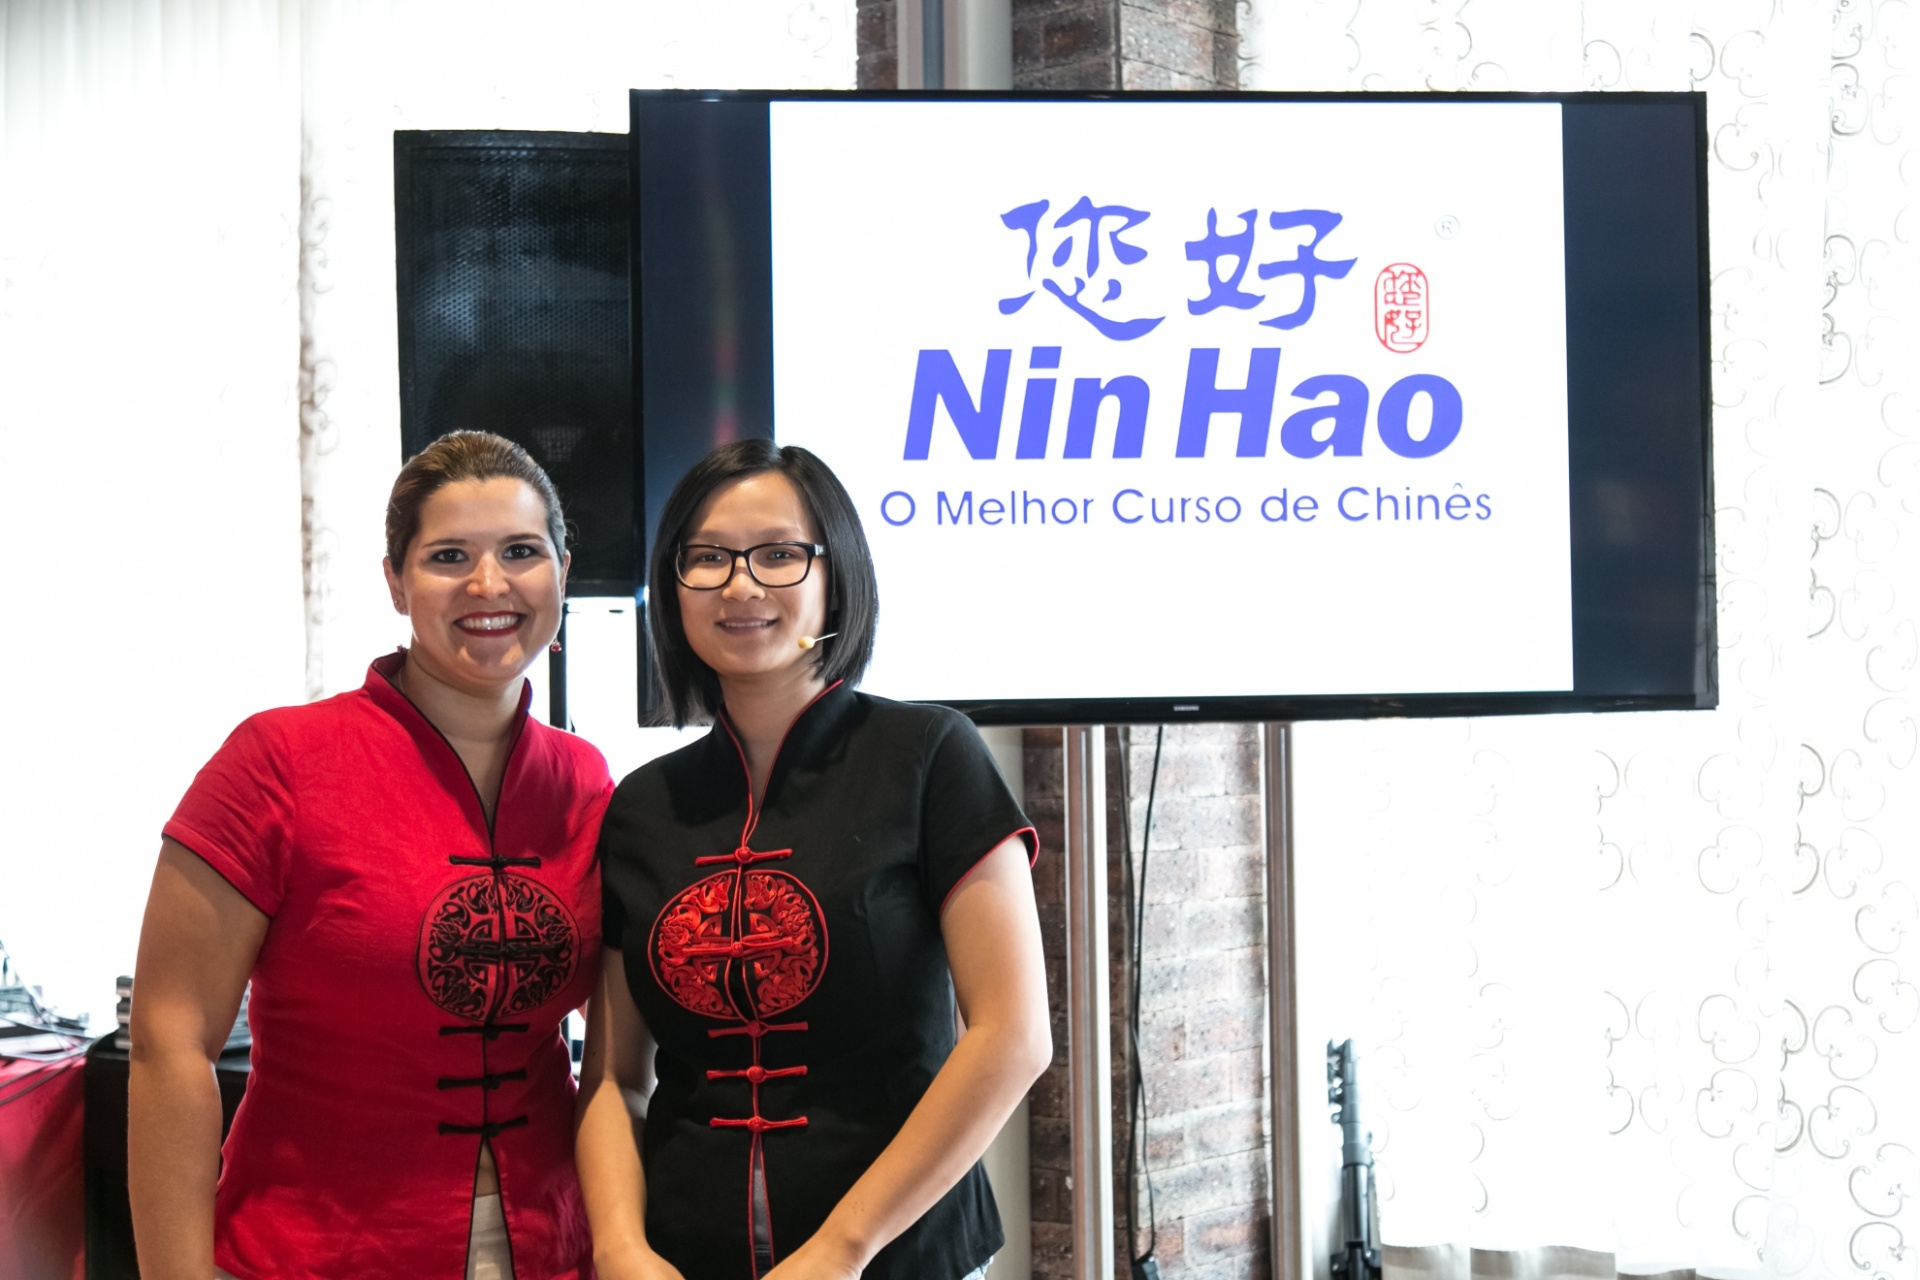 228676df07 Franquia de chinês ensina língua